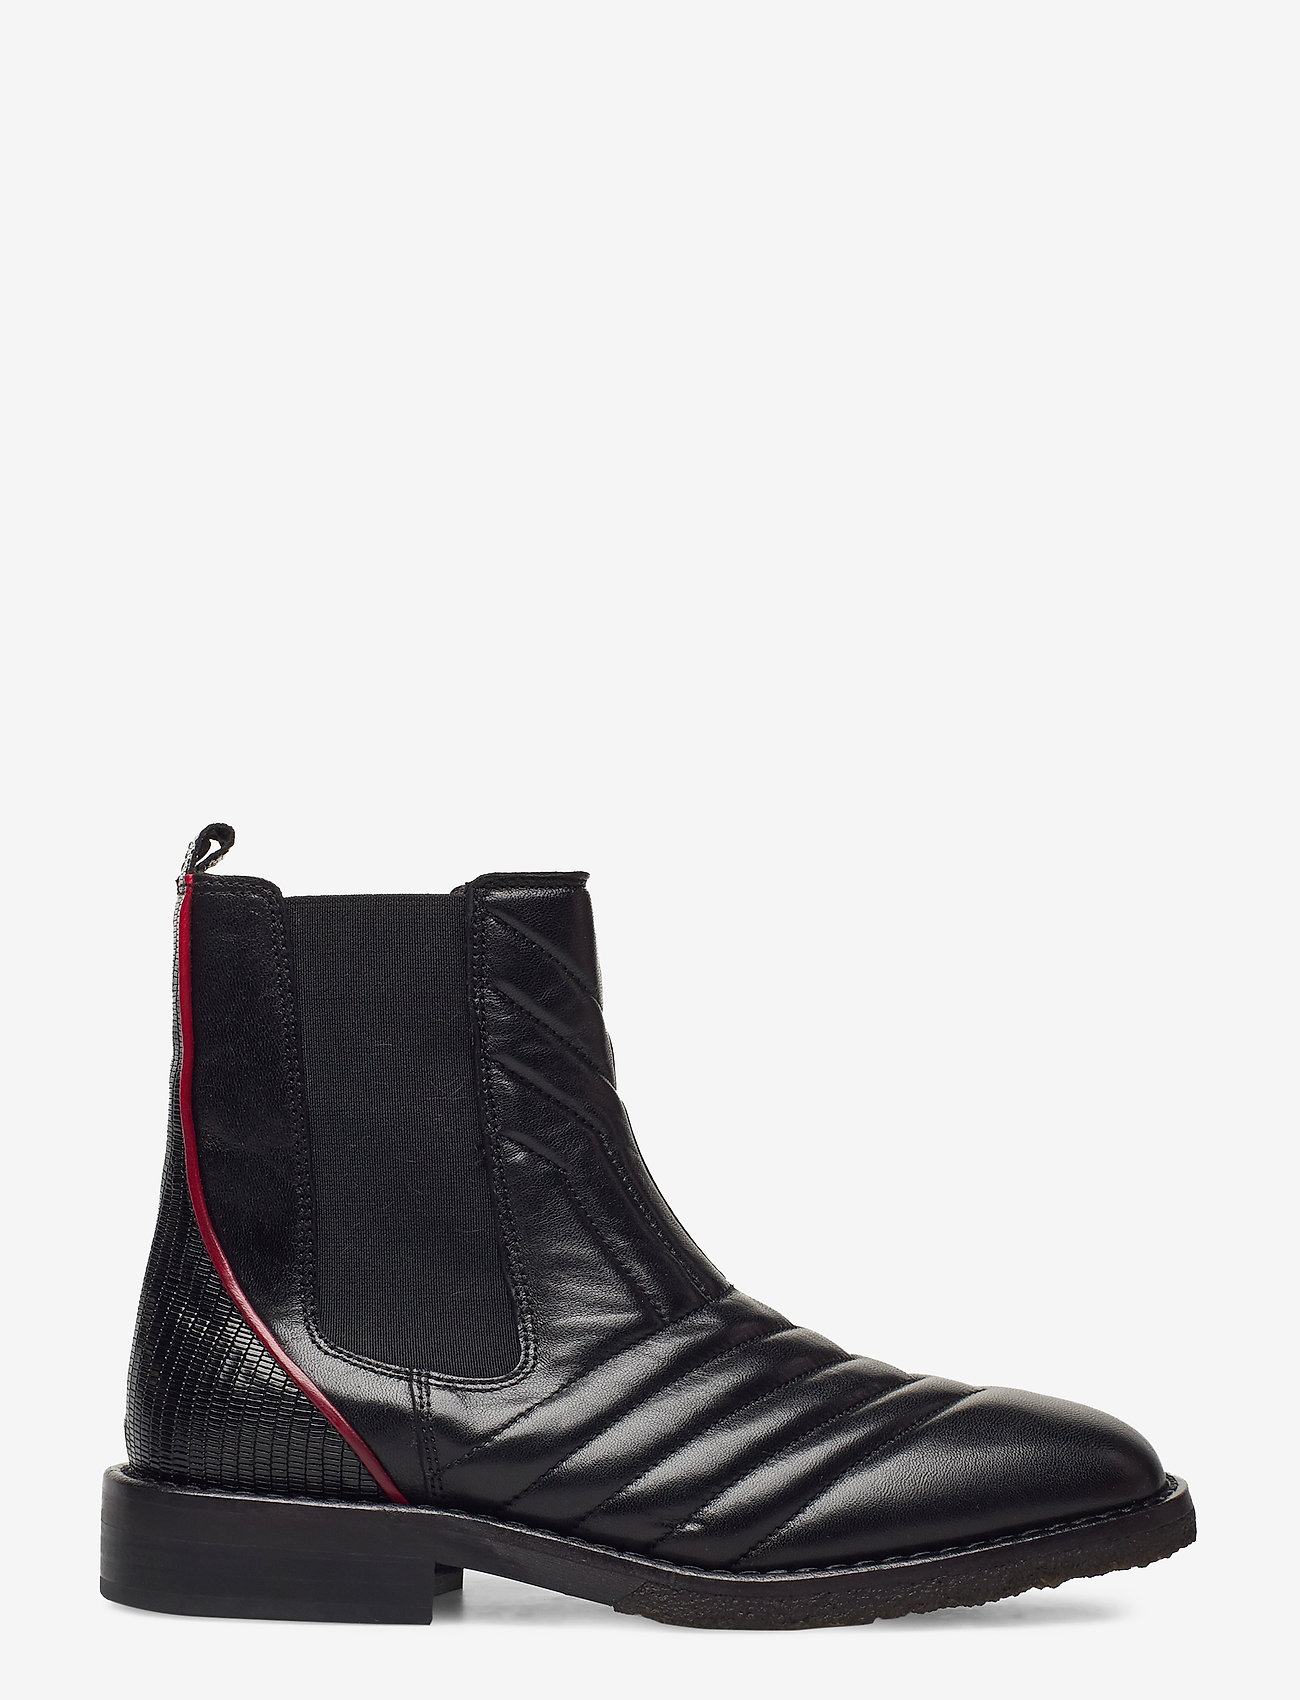 Billi Bi - Boots 4843 - chelsea boots - black nappa/red stripe 70 - 1